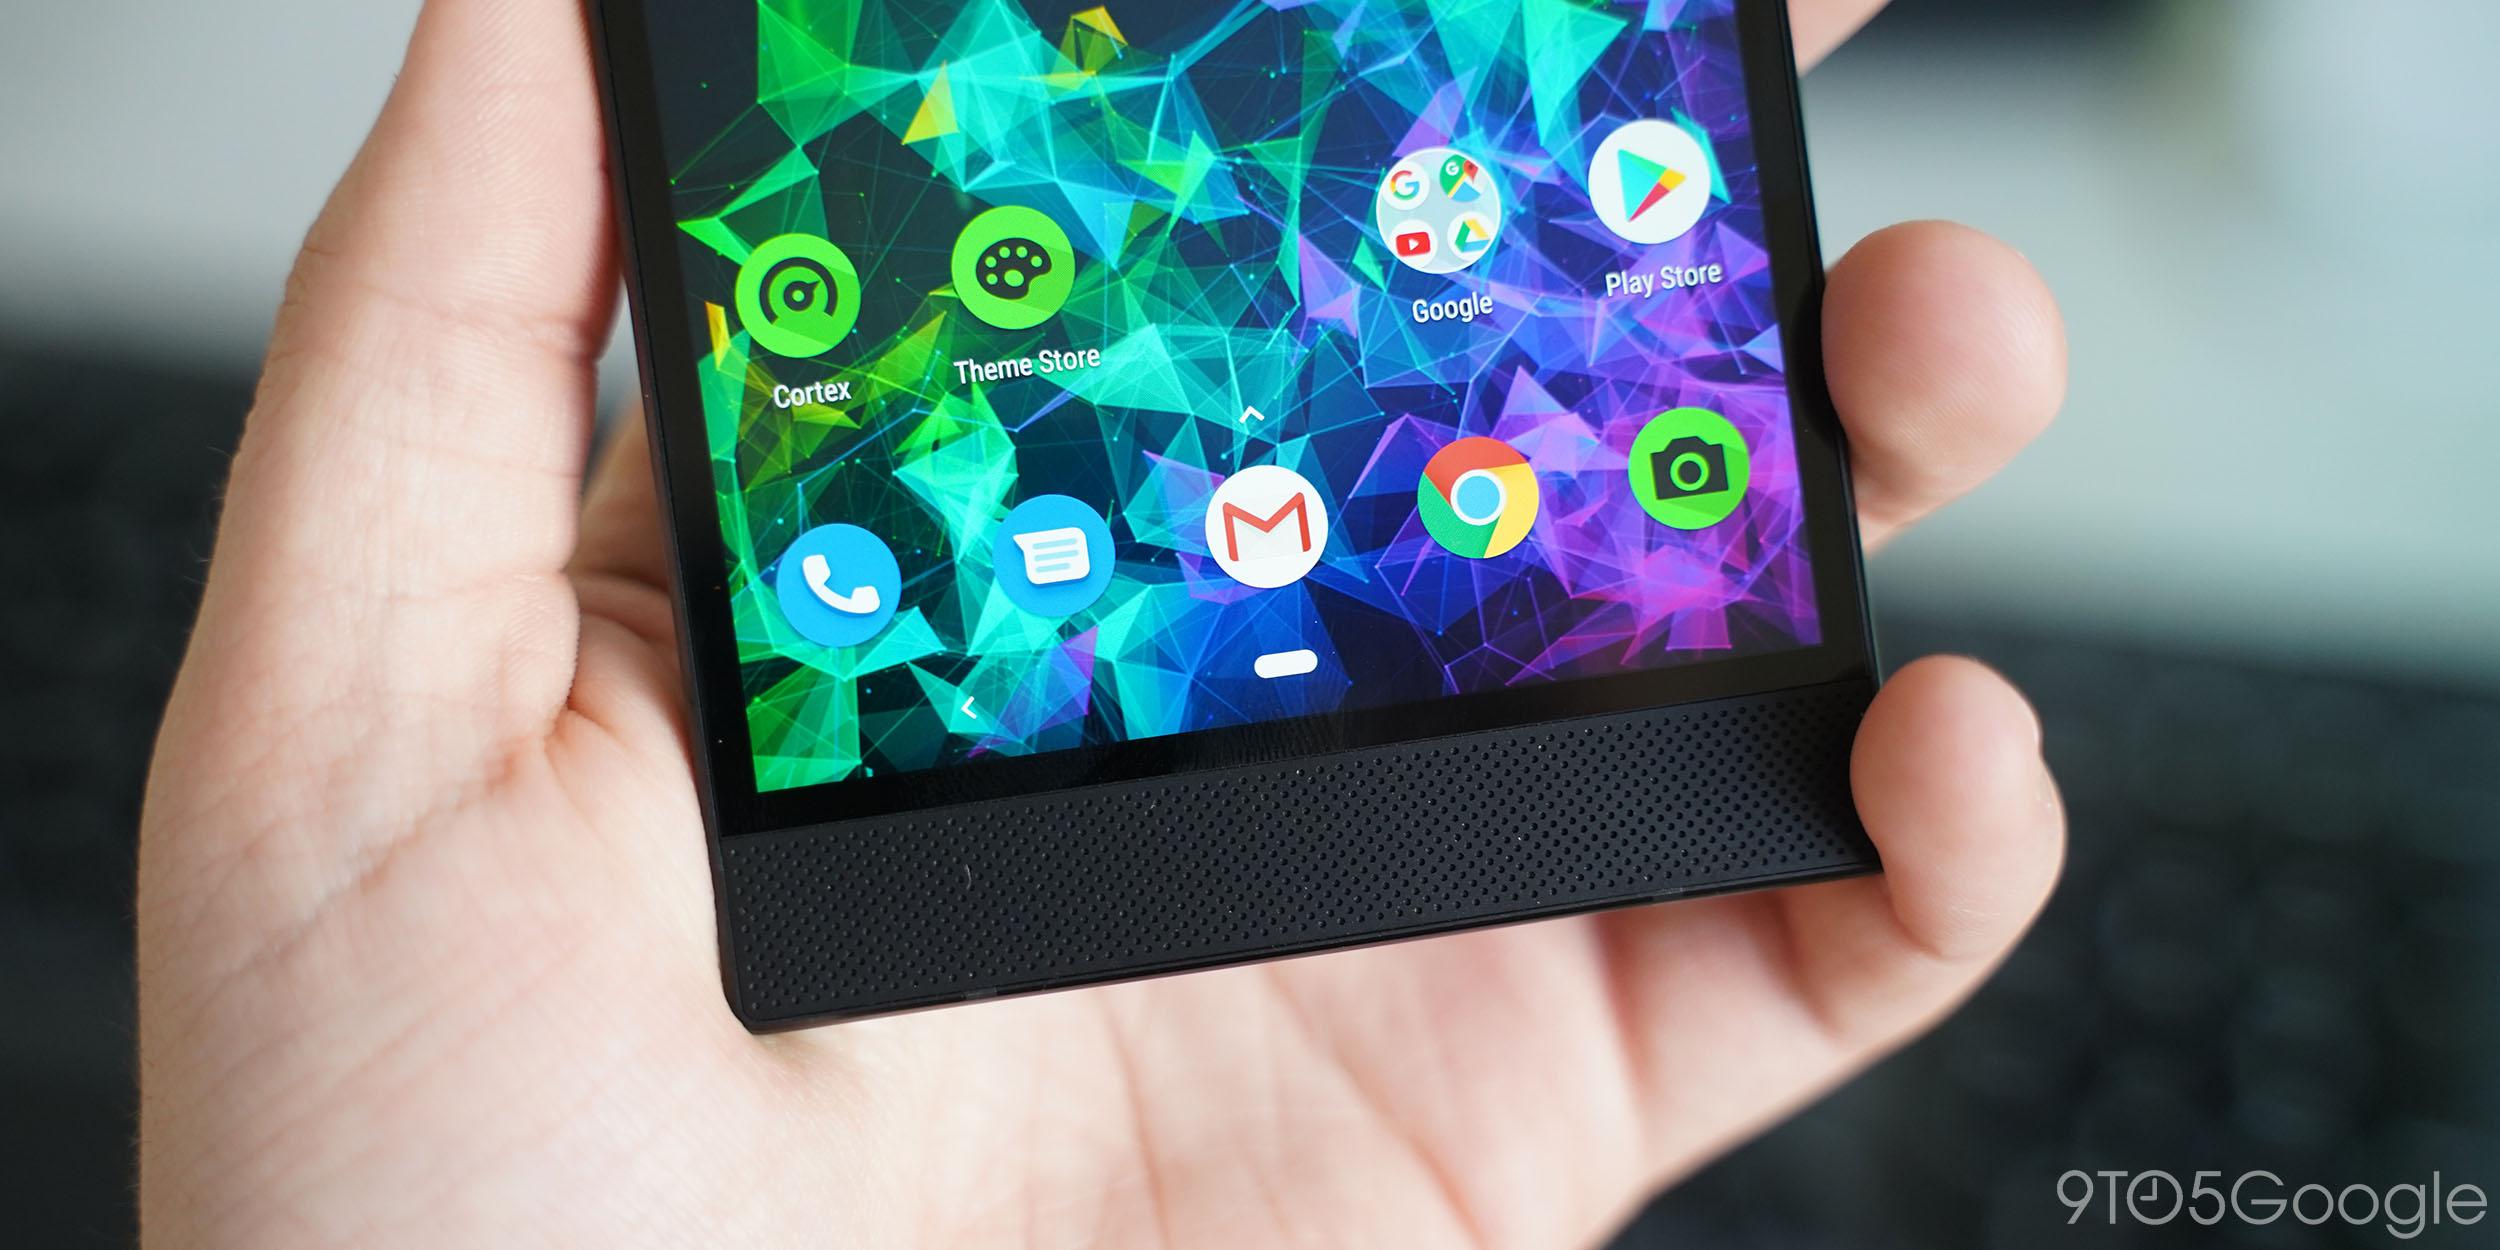 Hands-on: Razer Phone 2 gets Android 9 Pie starting next week, here's a sneak peek